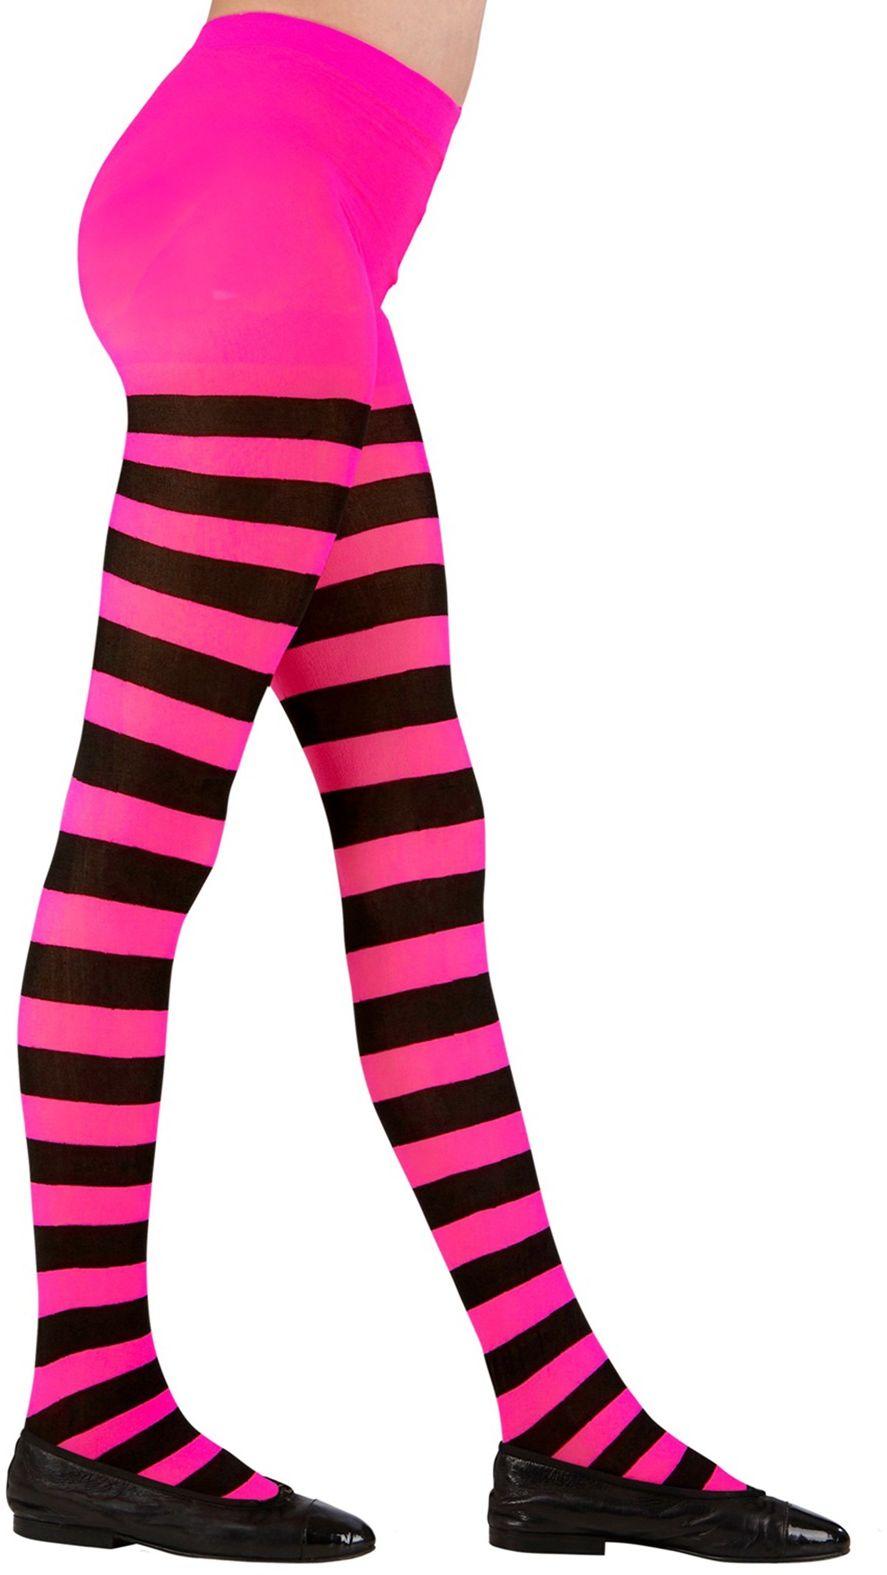 Roze zwart gestreepte kinderpanty